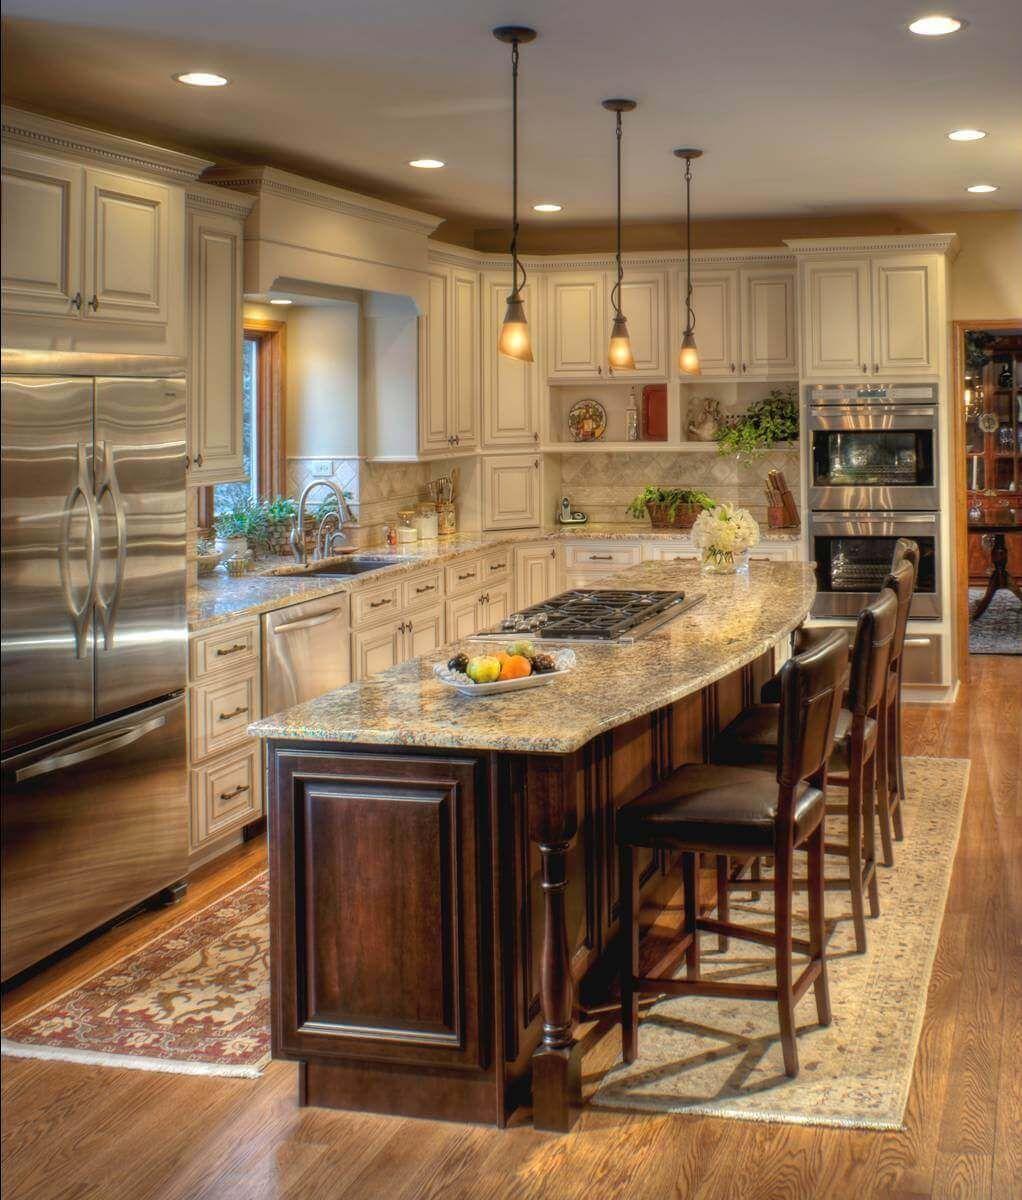 68 Deluxe Custom Kitchen Island Ideas Jaw Dropping Designs Custom Kitchen Island Kitchen Layout Kitchen Design